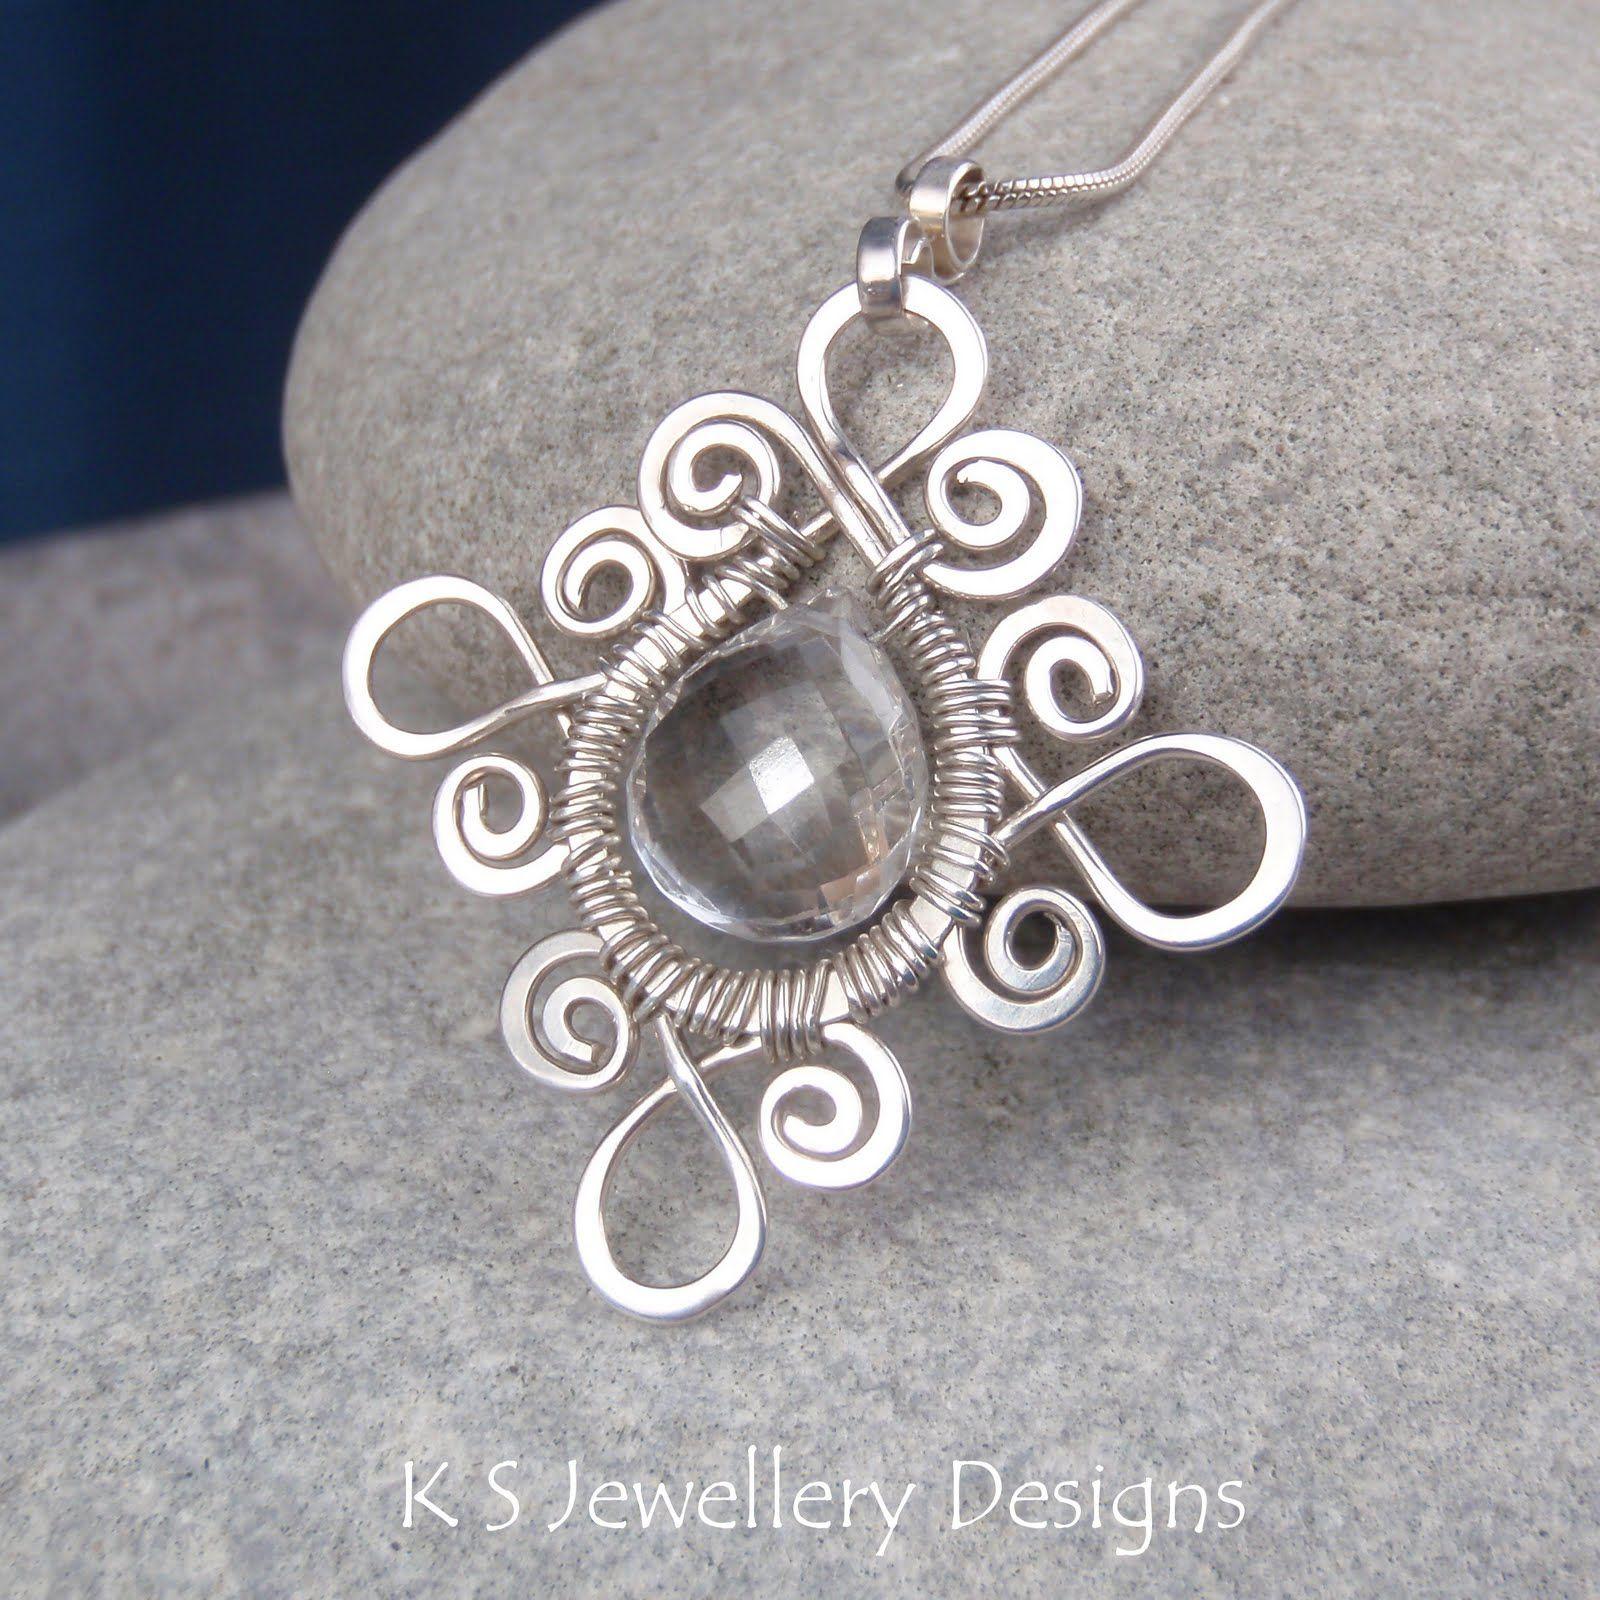 K S Jewellery Designs: New wire jewelry tutorial - Sprial Loop ...